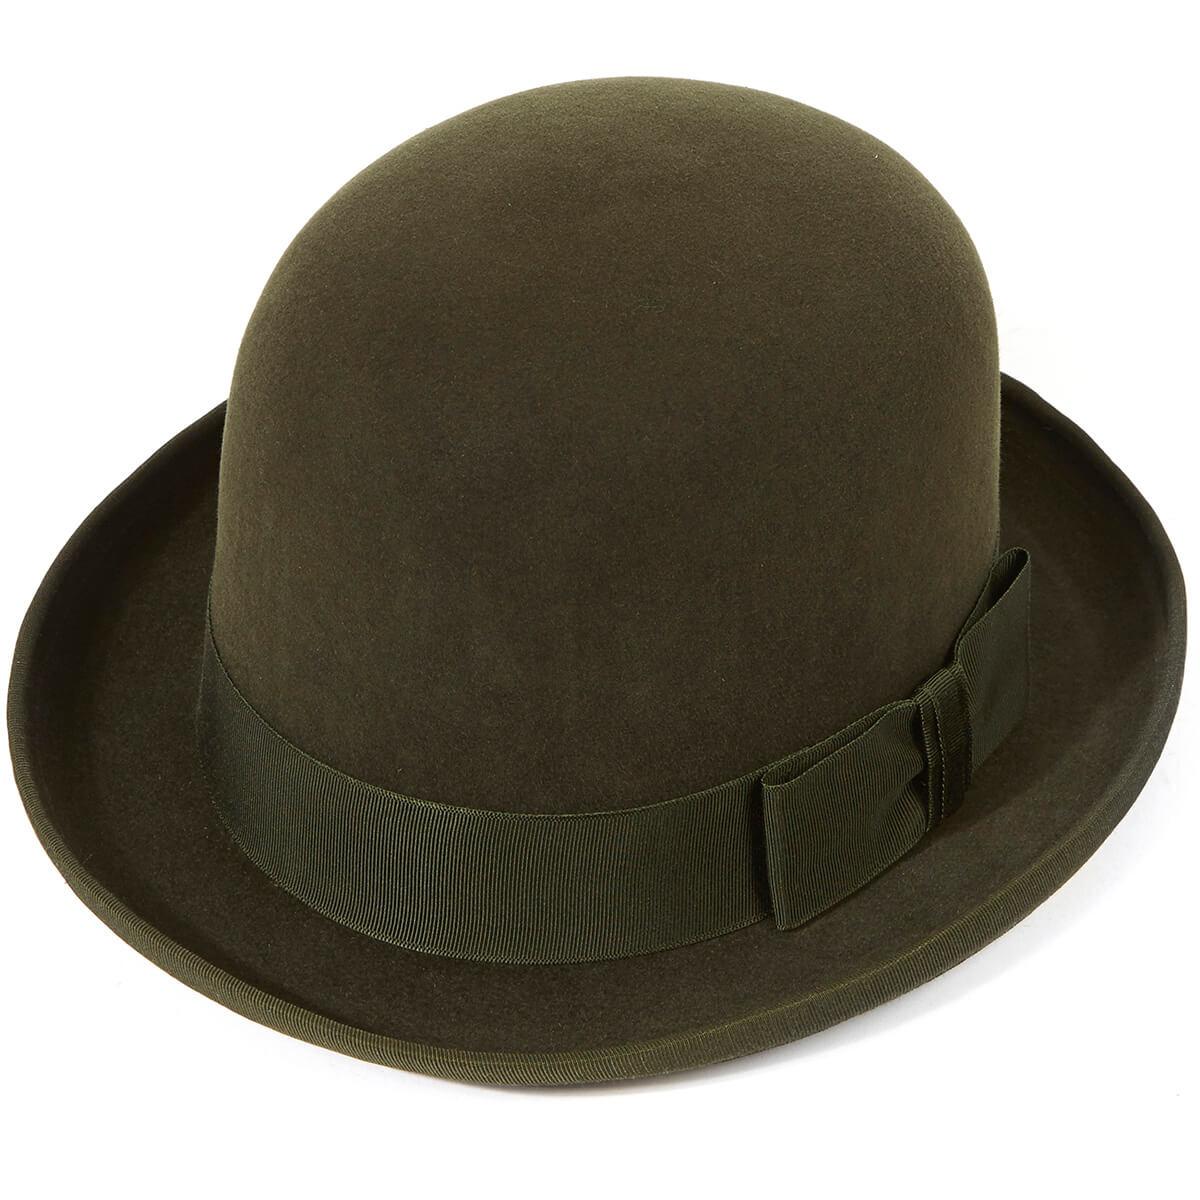 Homburg Hat - Elm - 62cm